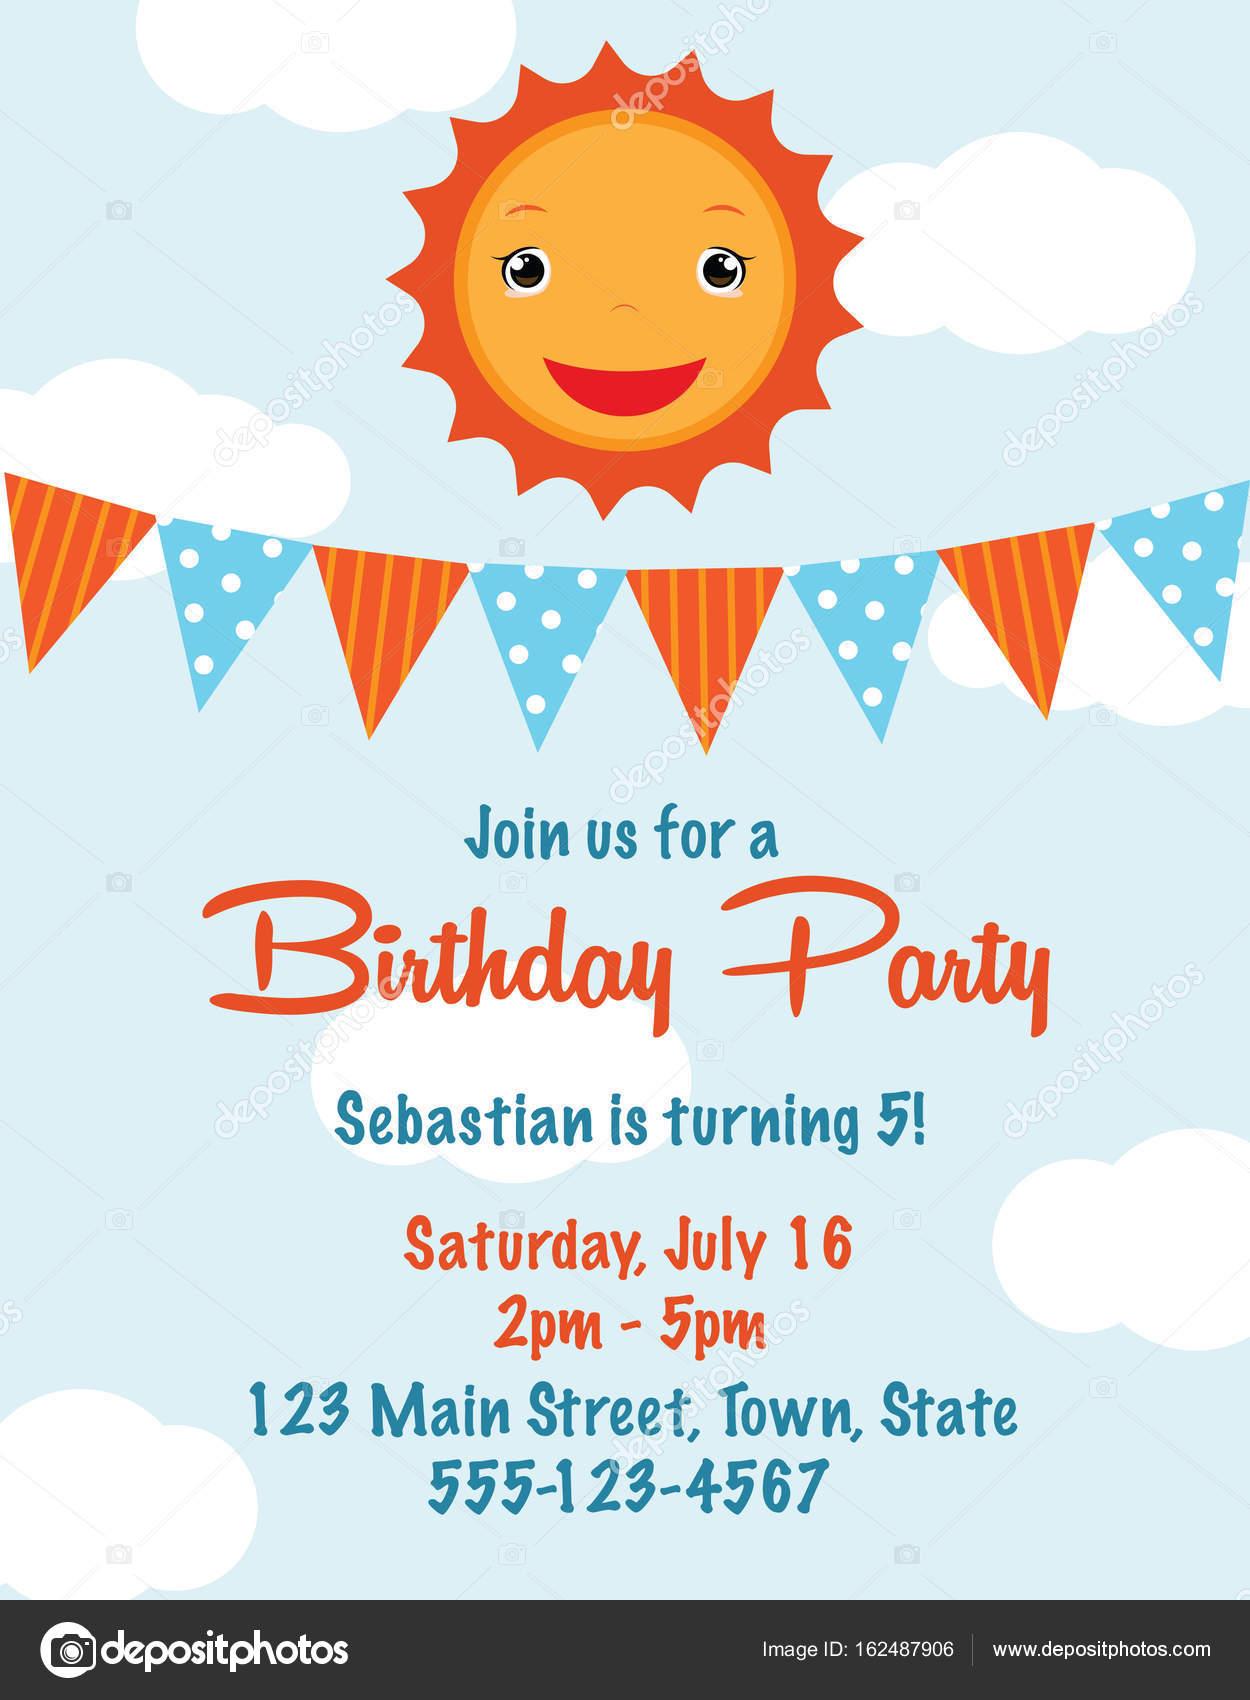 Cute cartoon sun birthday invitation card stock vector cute cartoon sun birthday invitation card stock vector stopboris Choice Image